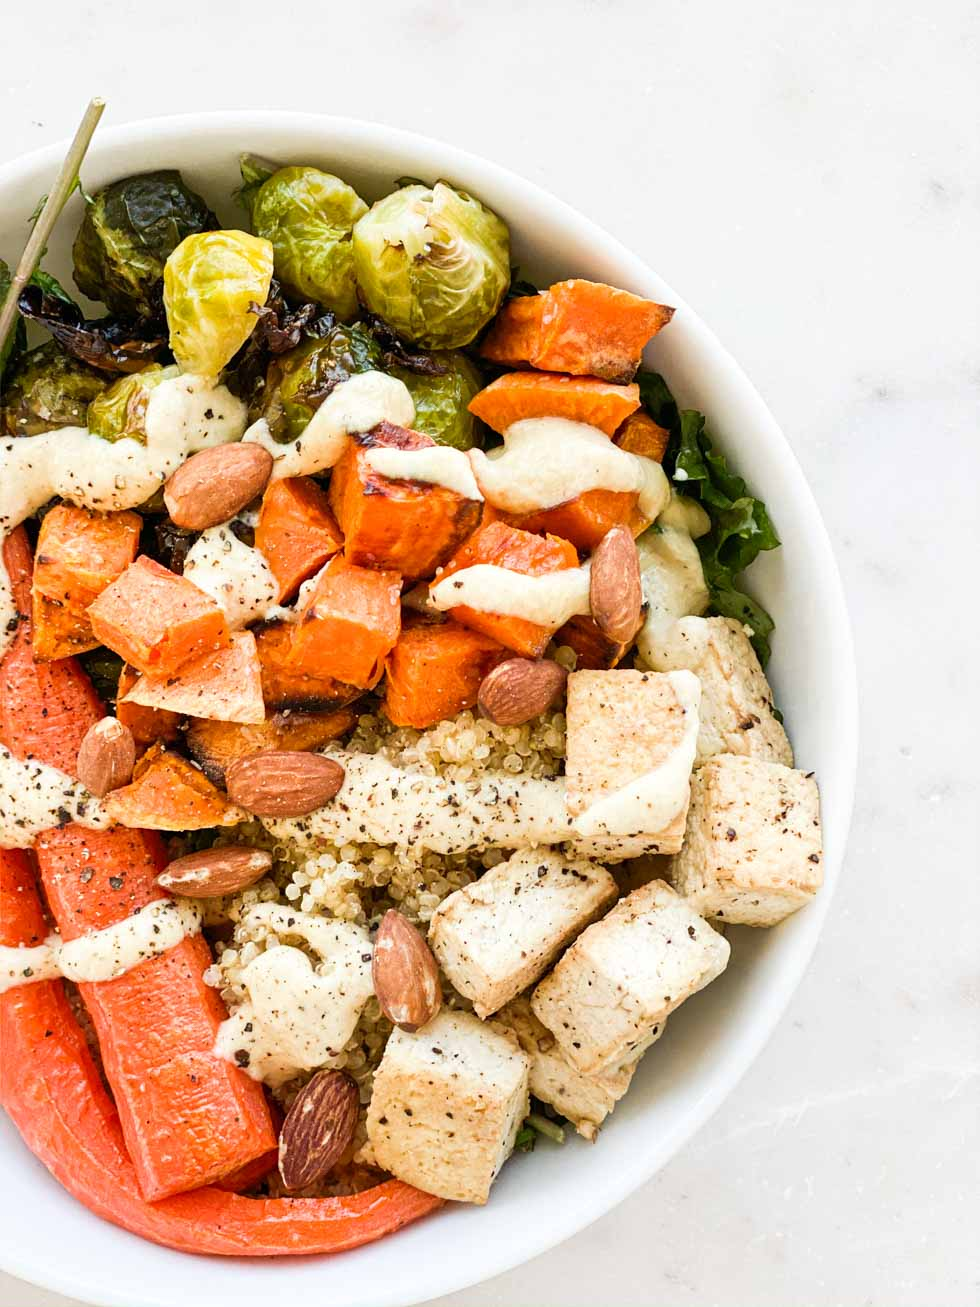 Gluten-Free Quinoa and Tofu Bowl